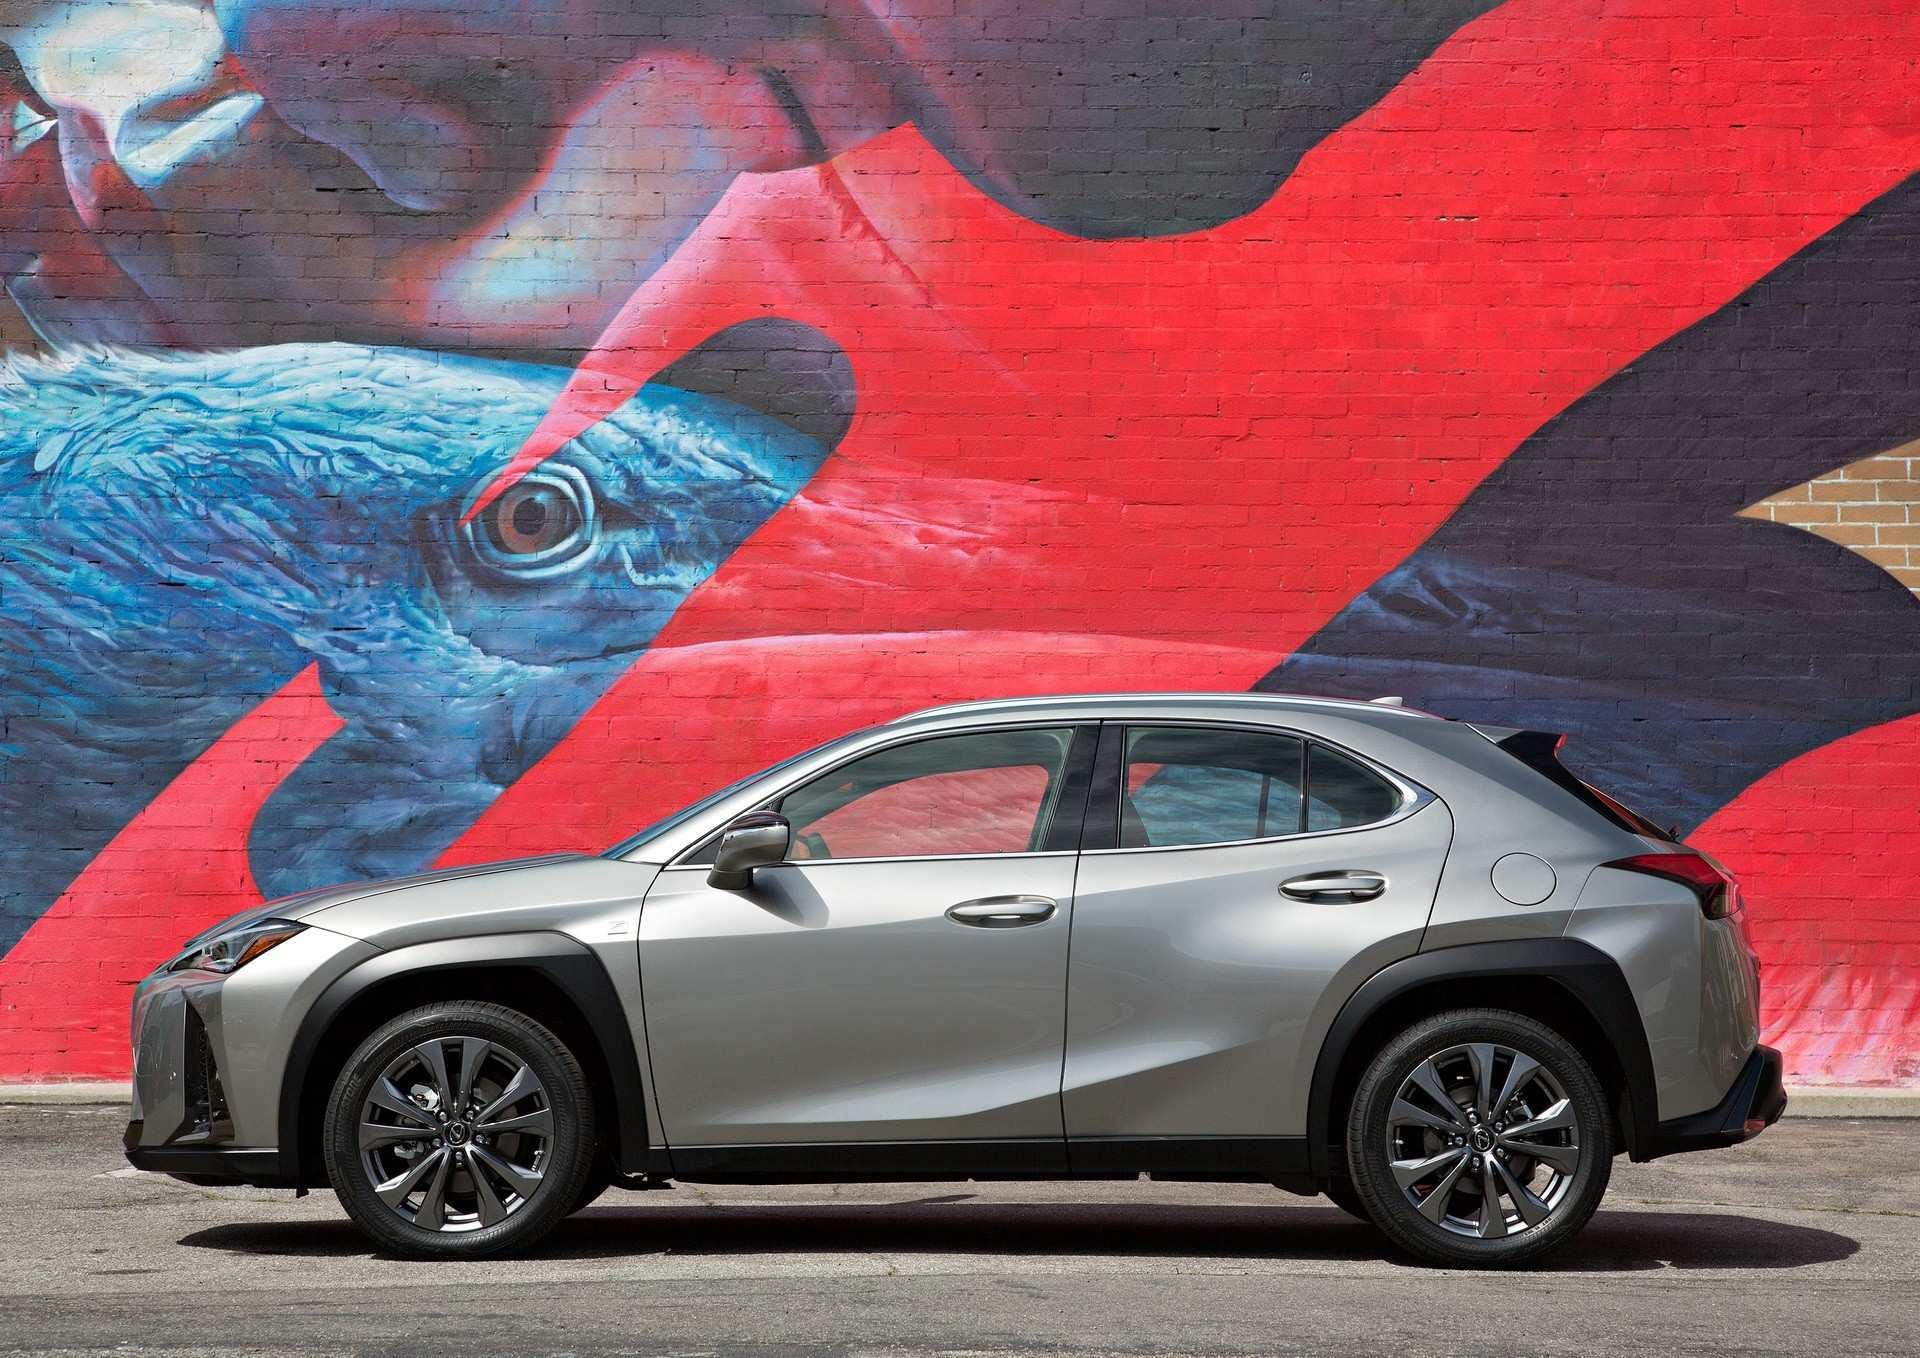 18 Concept of 2019 Lexus Ct Configurations by 2019 Lexus Ct